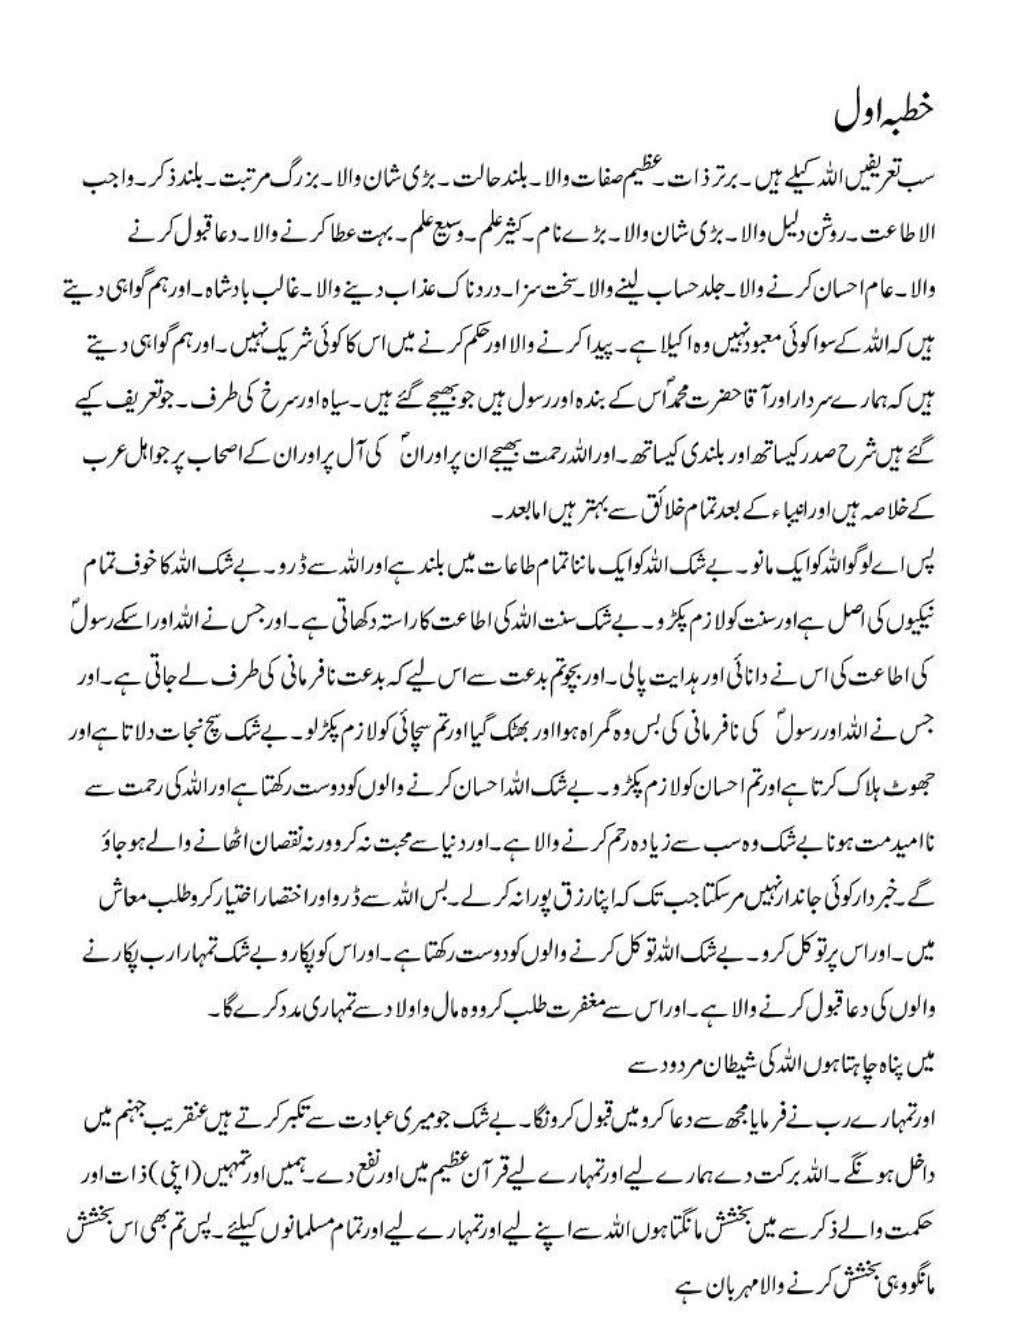 Khutba E Jumah With Urdu Translation Awal Aur Sani In 2020 Pdf Books Download Urdu Translation